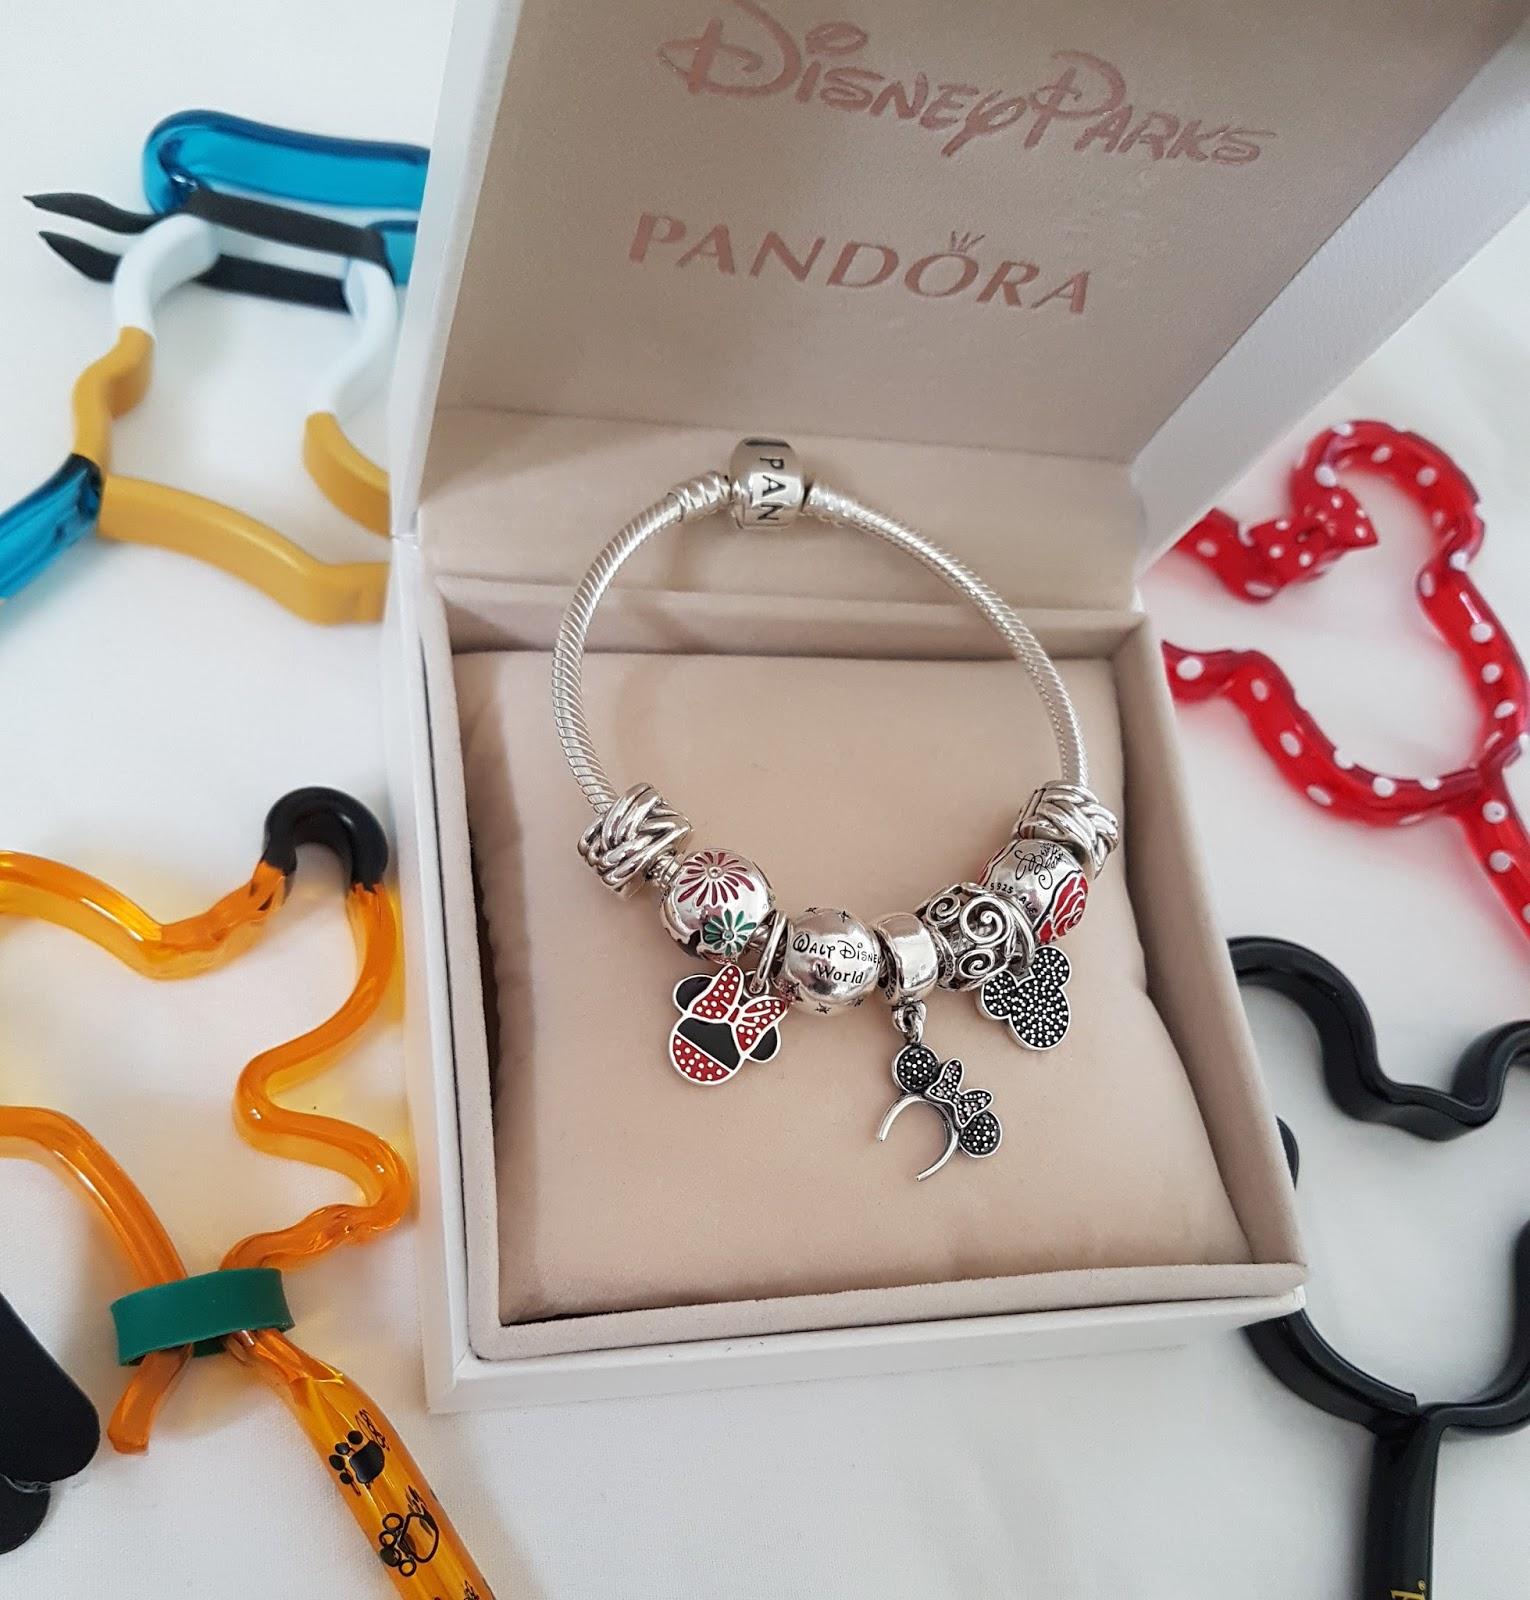 7d7c3bcb78074 Little Miss Disney: Disney Pandora has arrived in the UK!